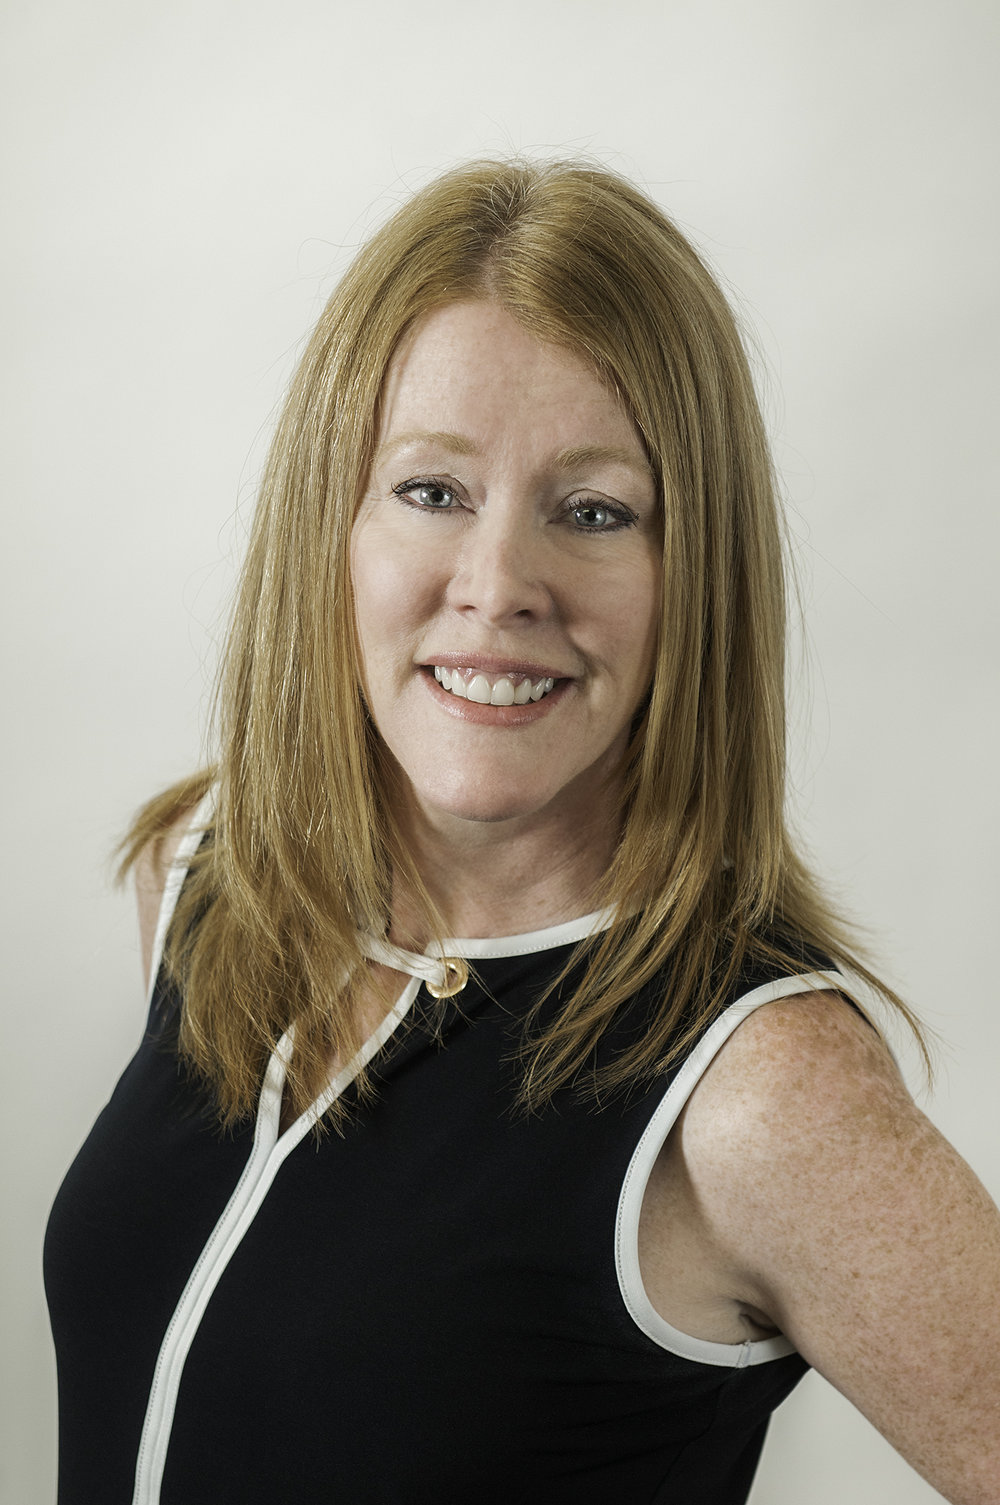 Tammy Taylor, MS, CCC-SLP